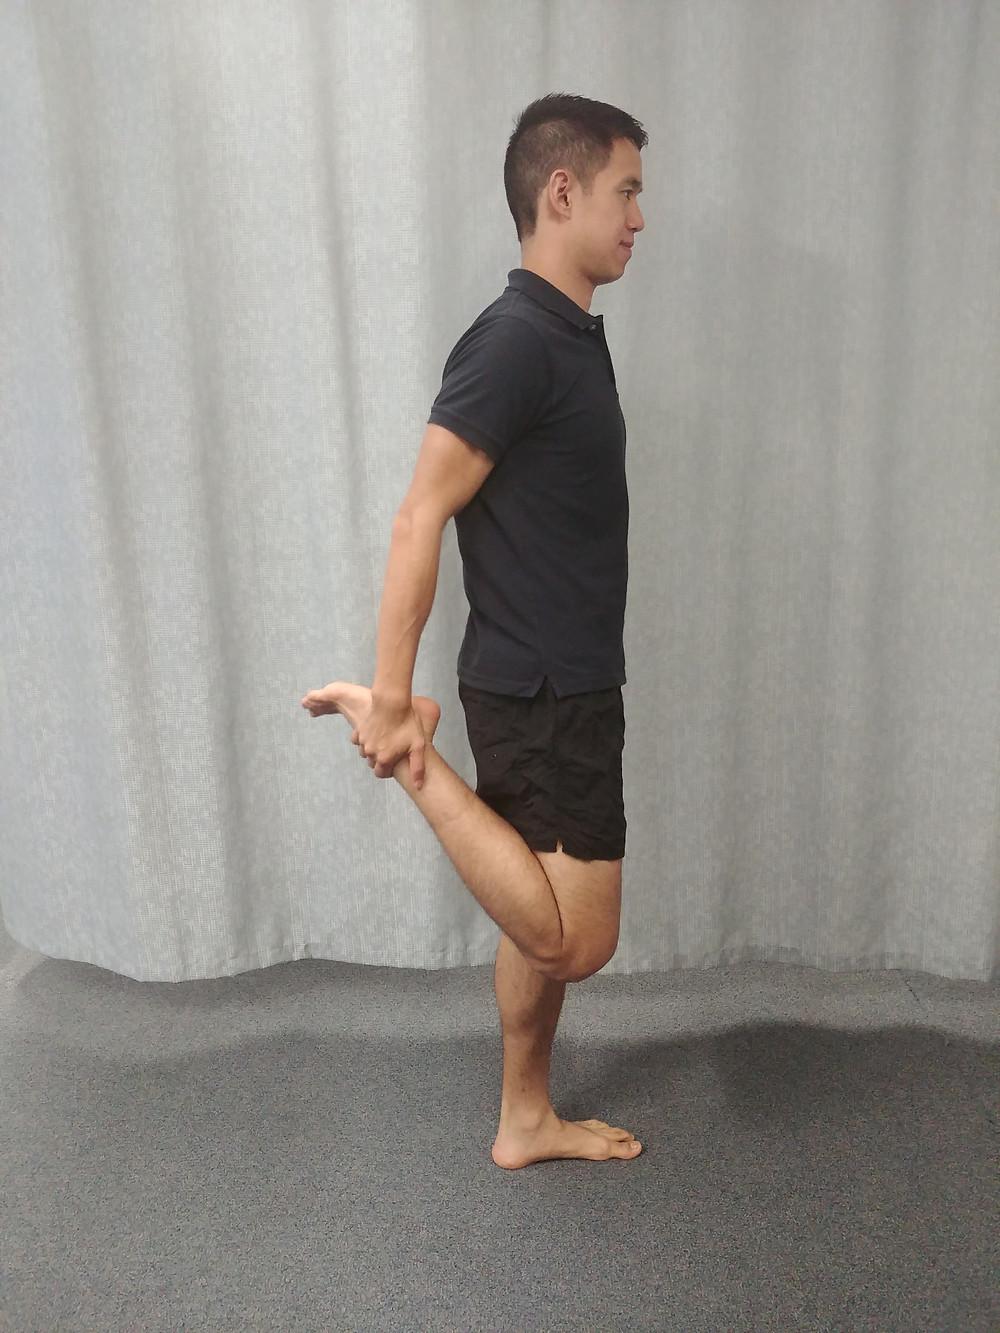 Standing quadriceps stretch for Osgood Schlatter's Disease